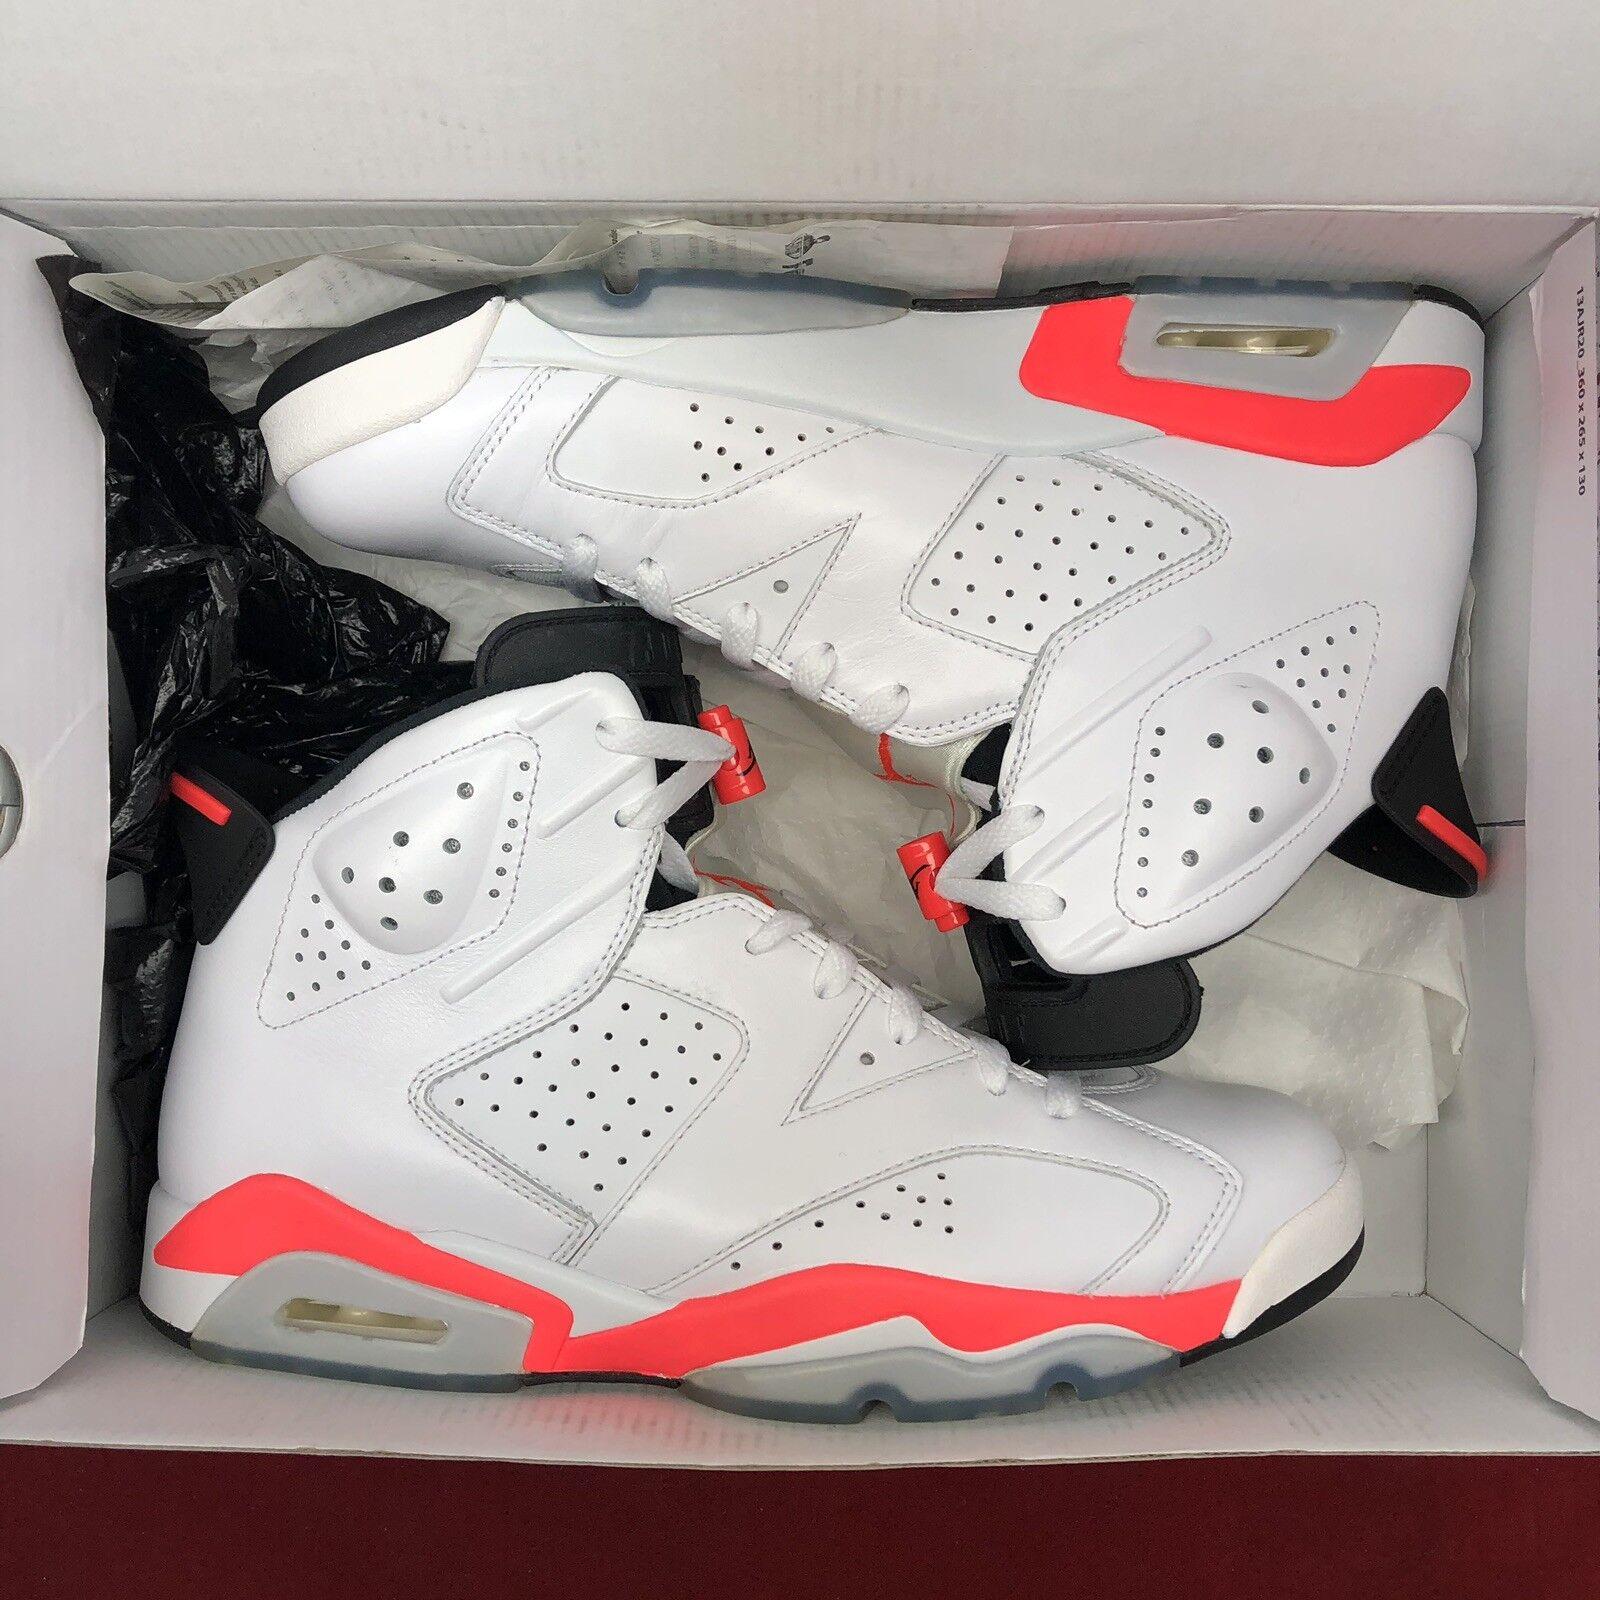 7066acb0777a Nike Air Jordan Retro VI Infrared Infrared Infrared Size 11 384664 123  White Black Varsity XI